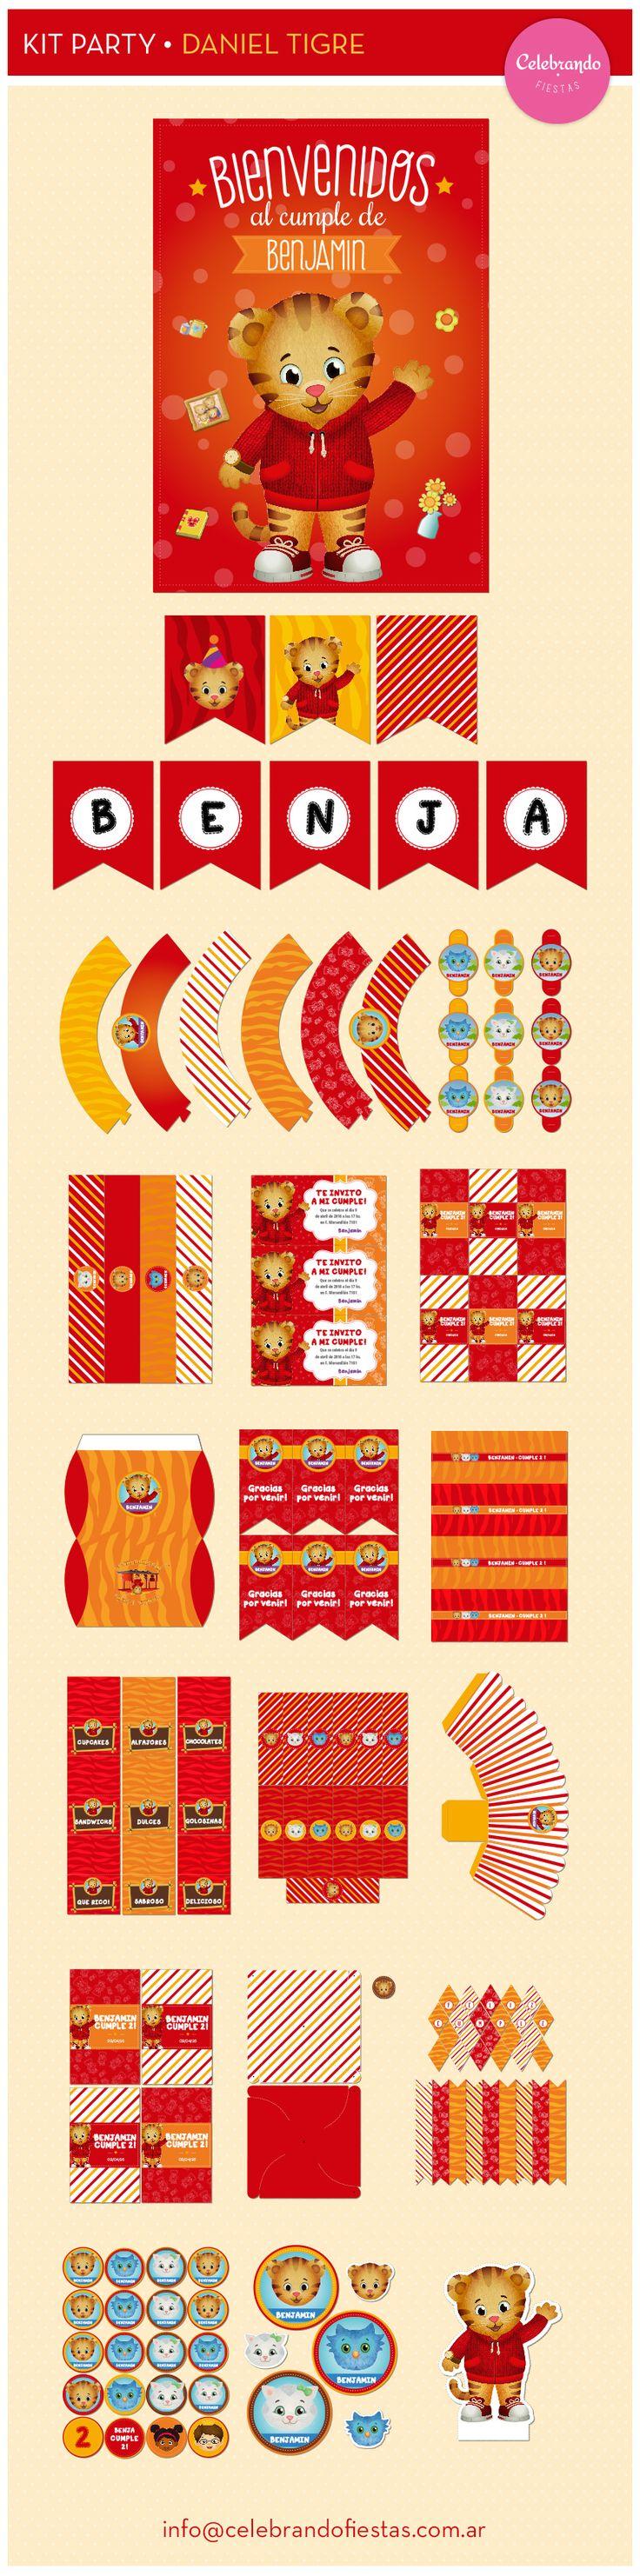 Kit imprimible Daniel el Tigre / Daniel Tiger's Neighborhood - Celebrando Fiestas